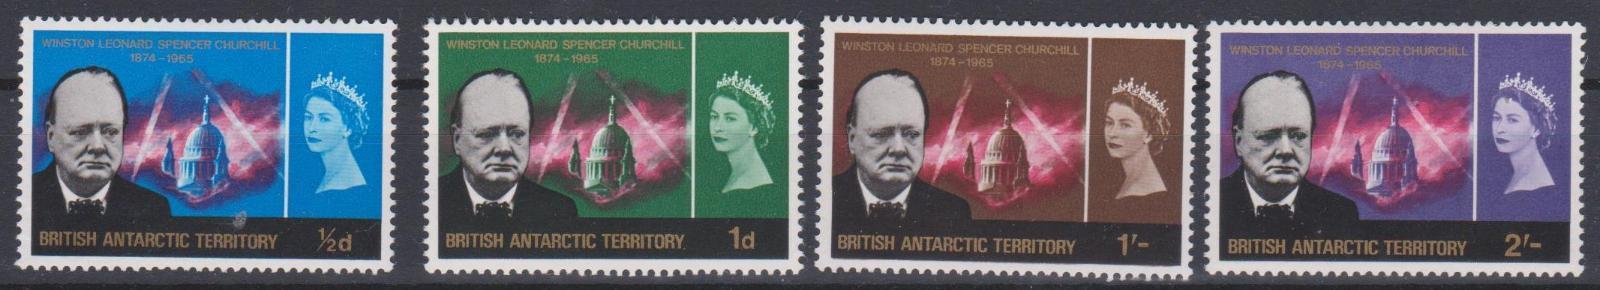 Britská Antarktída 1966, serie W.S.Churchill, svěží